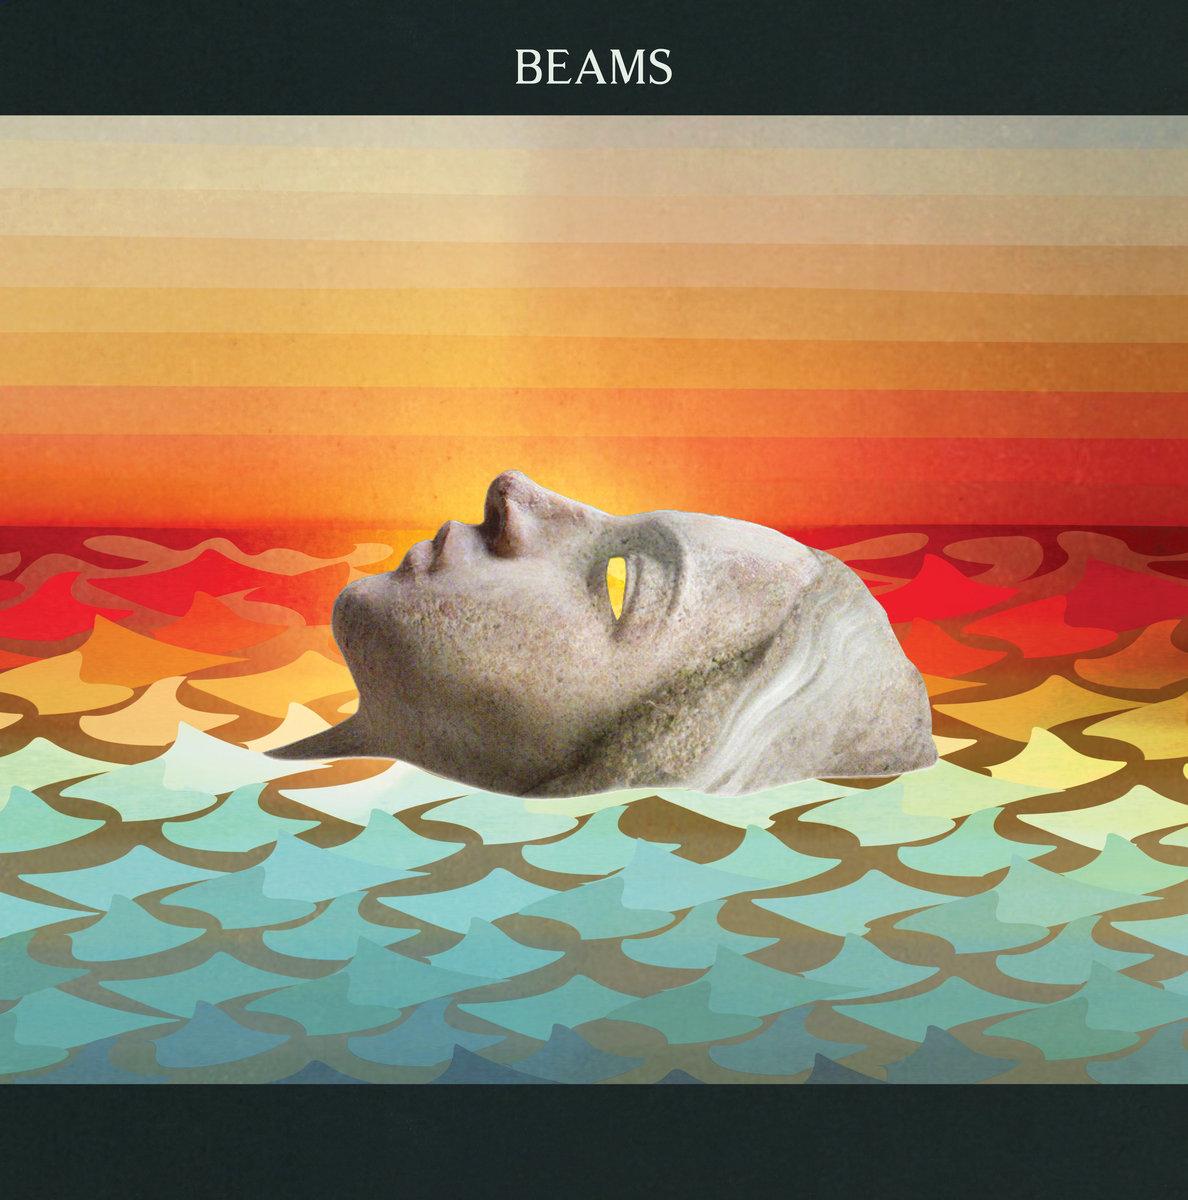 Beams - Teach Me To Love